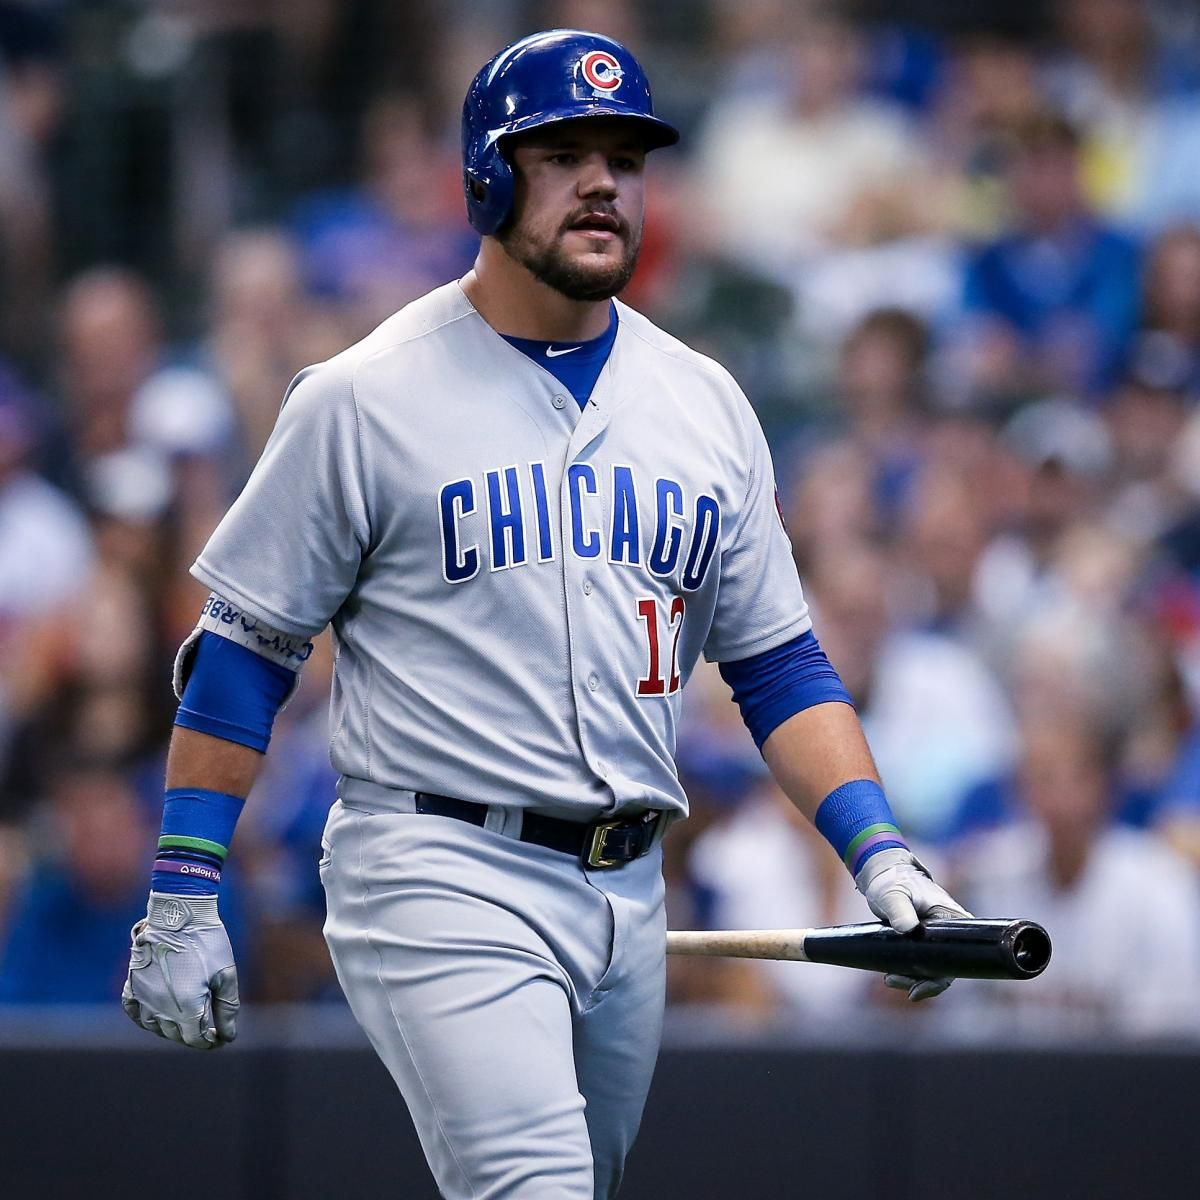 Mlb Trade Rumors Cubs Have Rejected Calls About Kyle Schwarber Kyle Schwarber Chicago Cubs Baseball Cubs Baseball